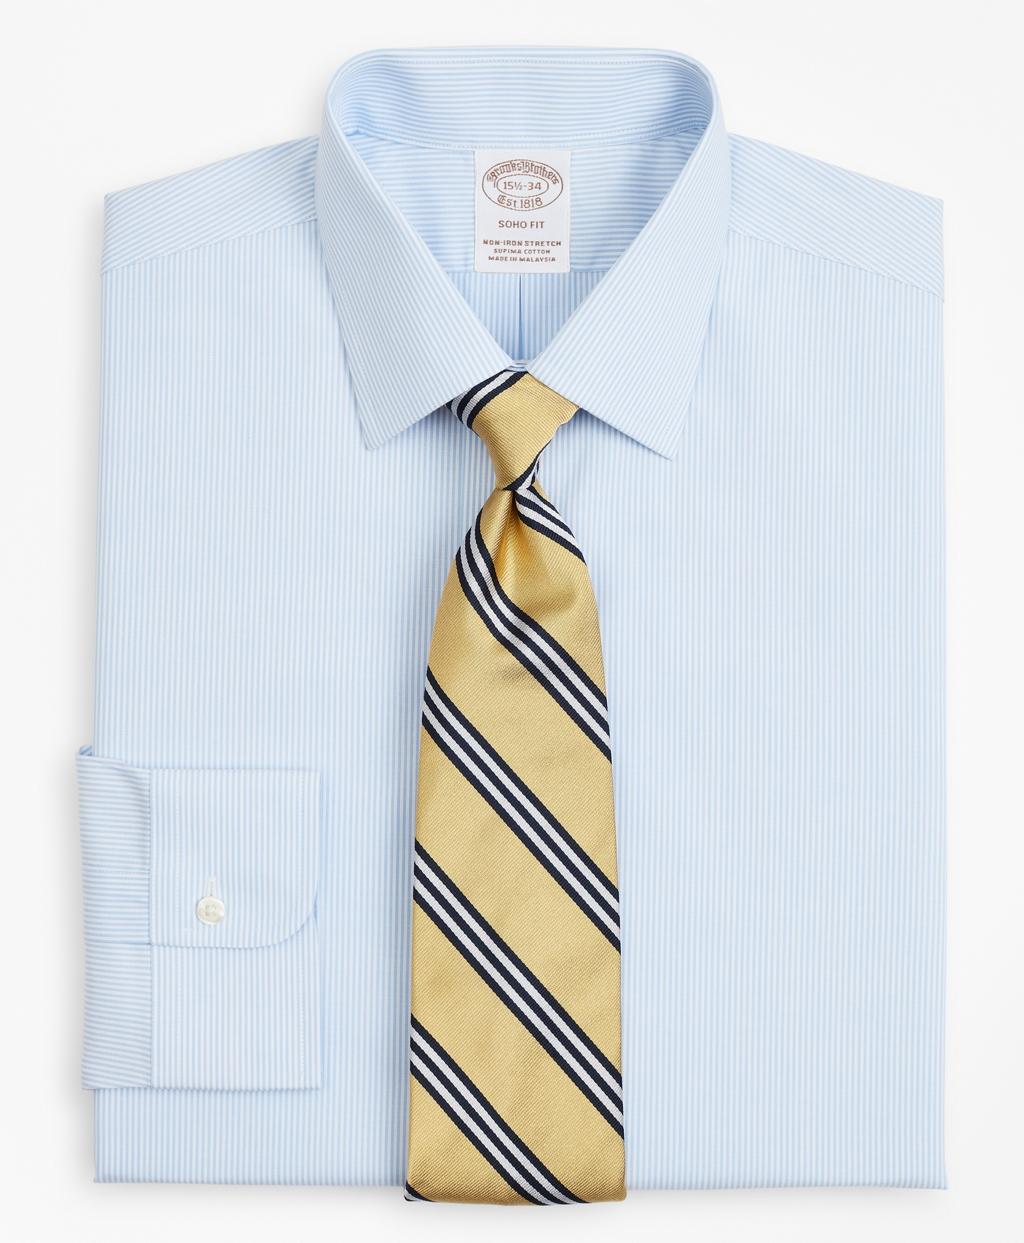 Brooksbrothers Stretch Soho Extra-Slim-Fit Dress Shirt, Non-Iron Poplin Ainsley Collar Fine Stripe